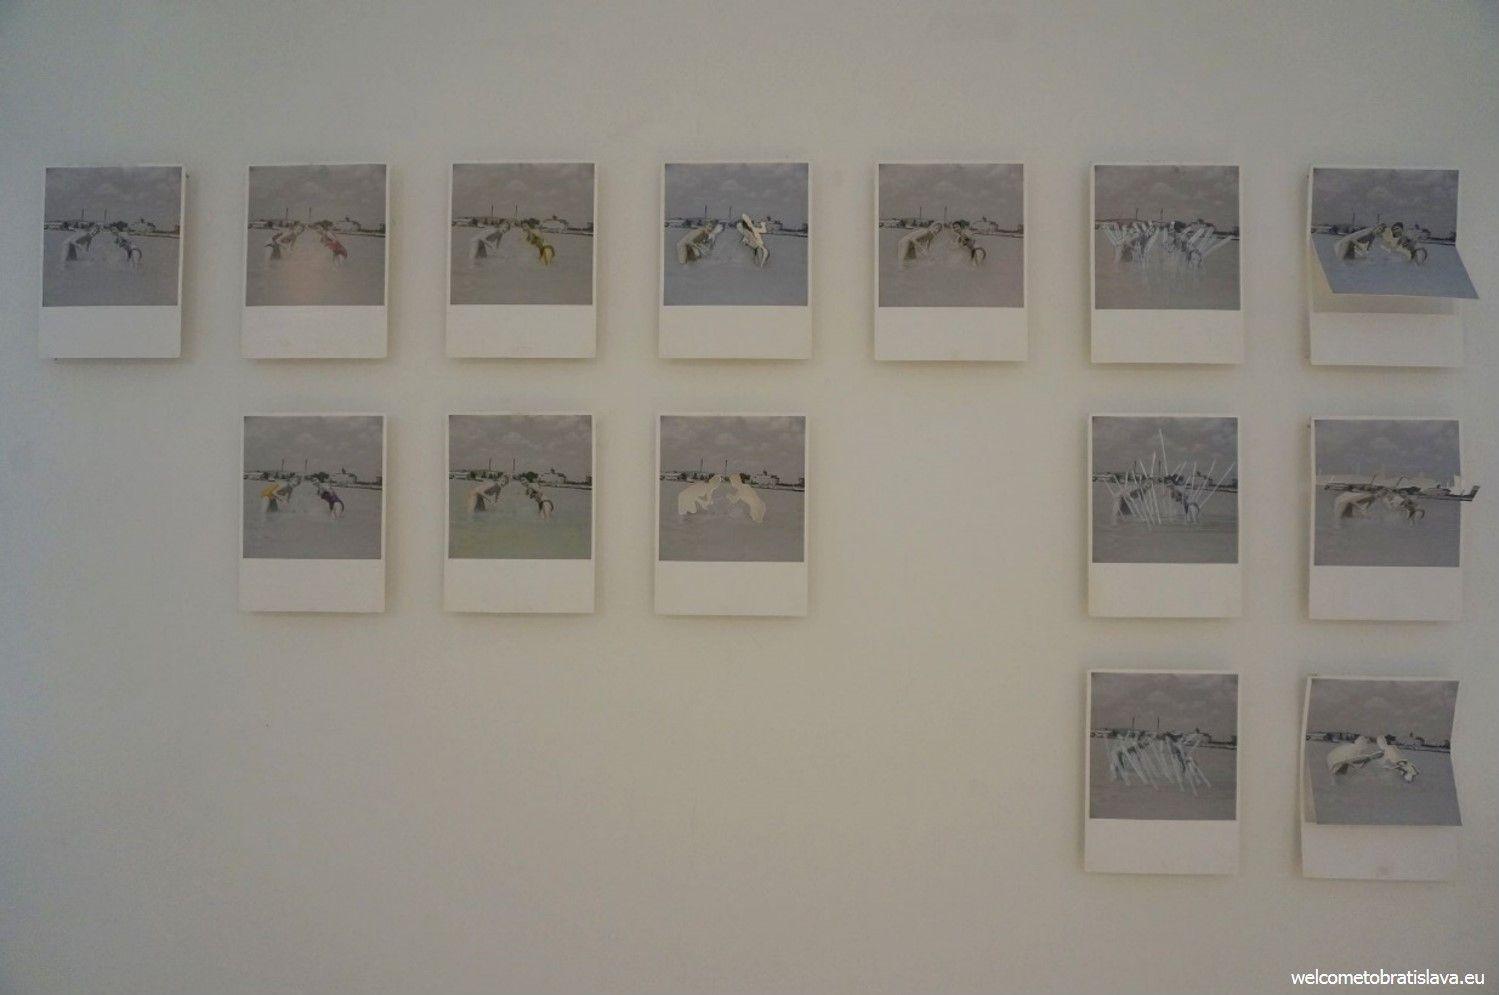 Gallery X - example of art